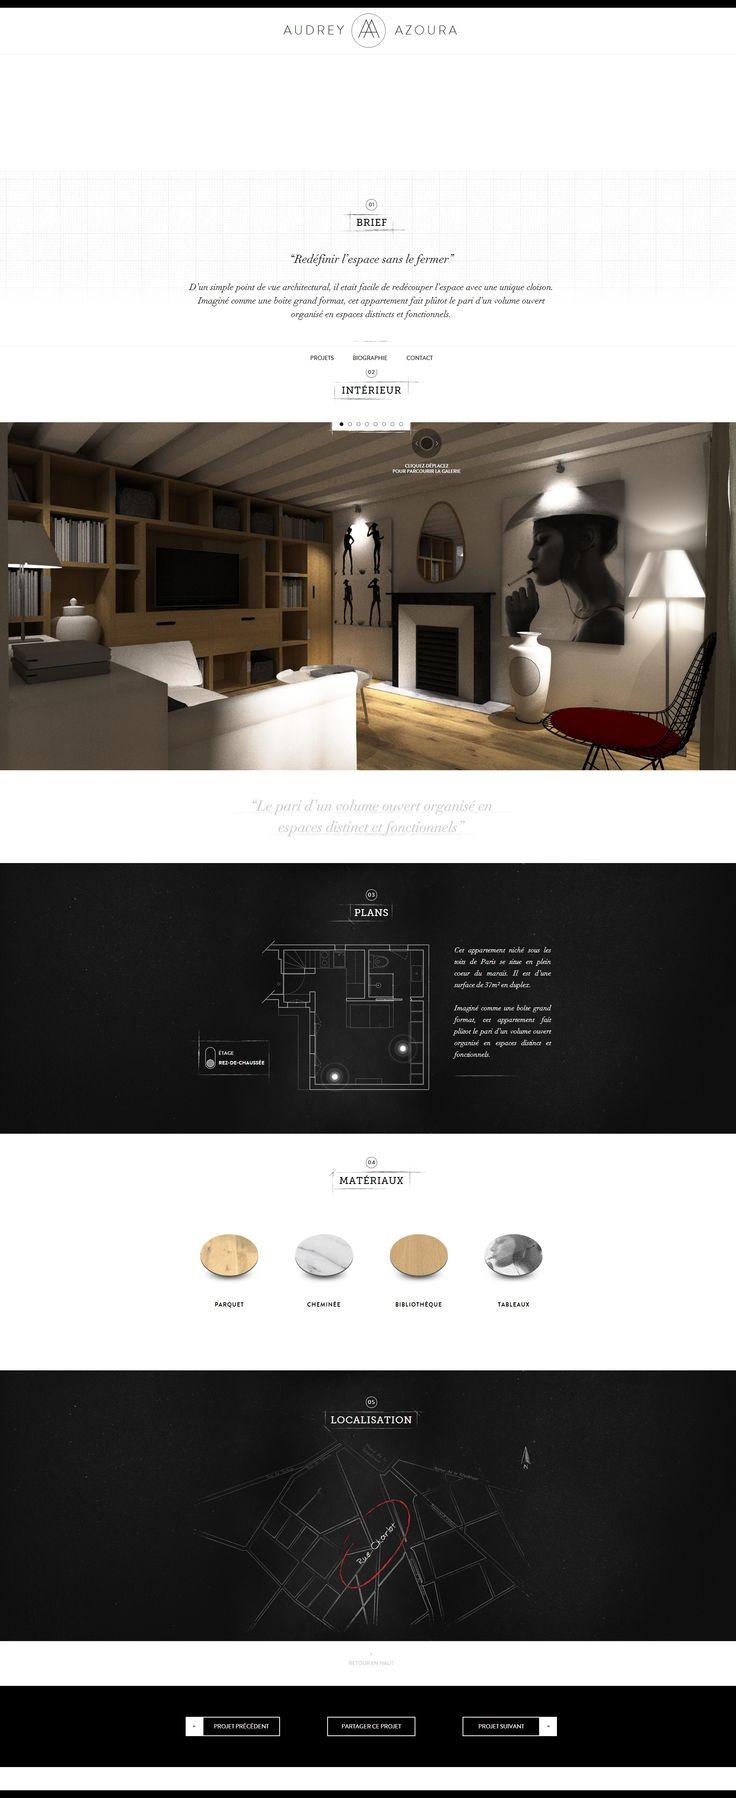 http://www.audreyazoura.fr/appartement-rue-charlot